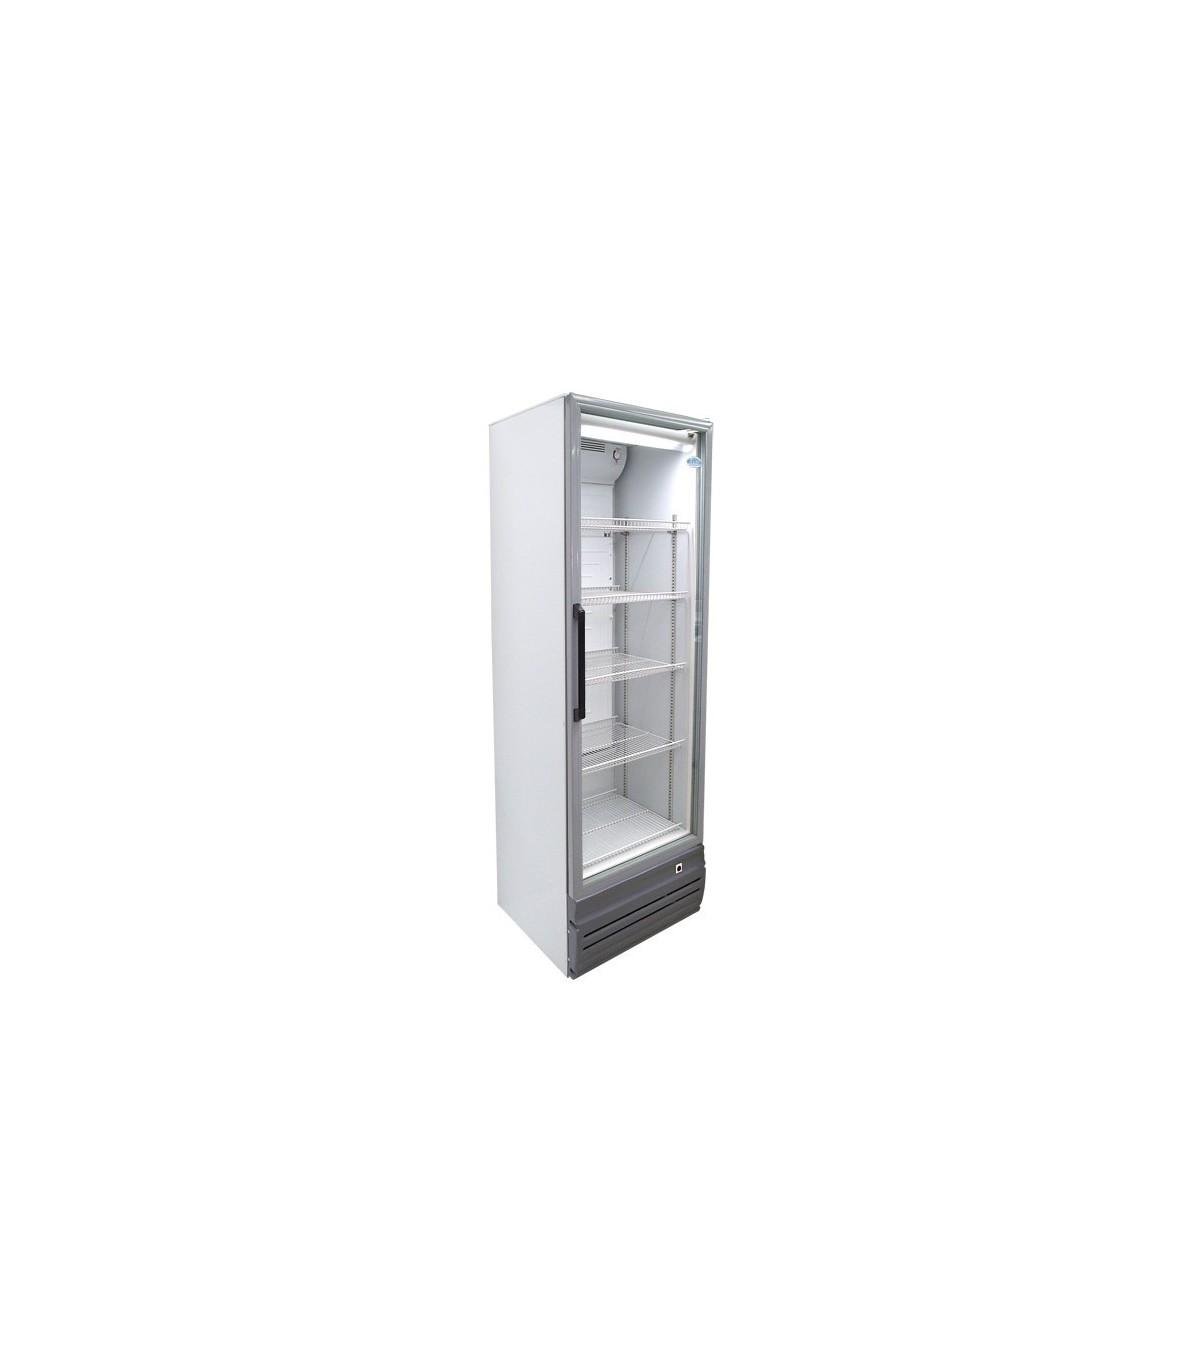 Para que tu negocio arranque eleg ama hogar - Temperatura freezer casa ...